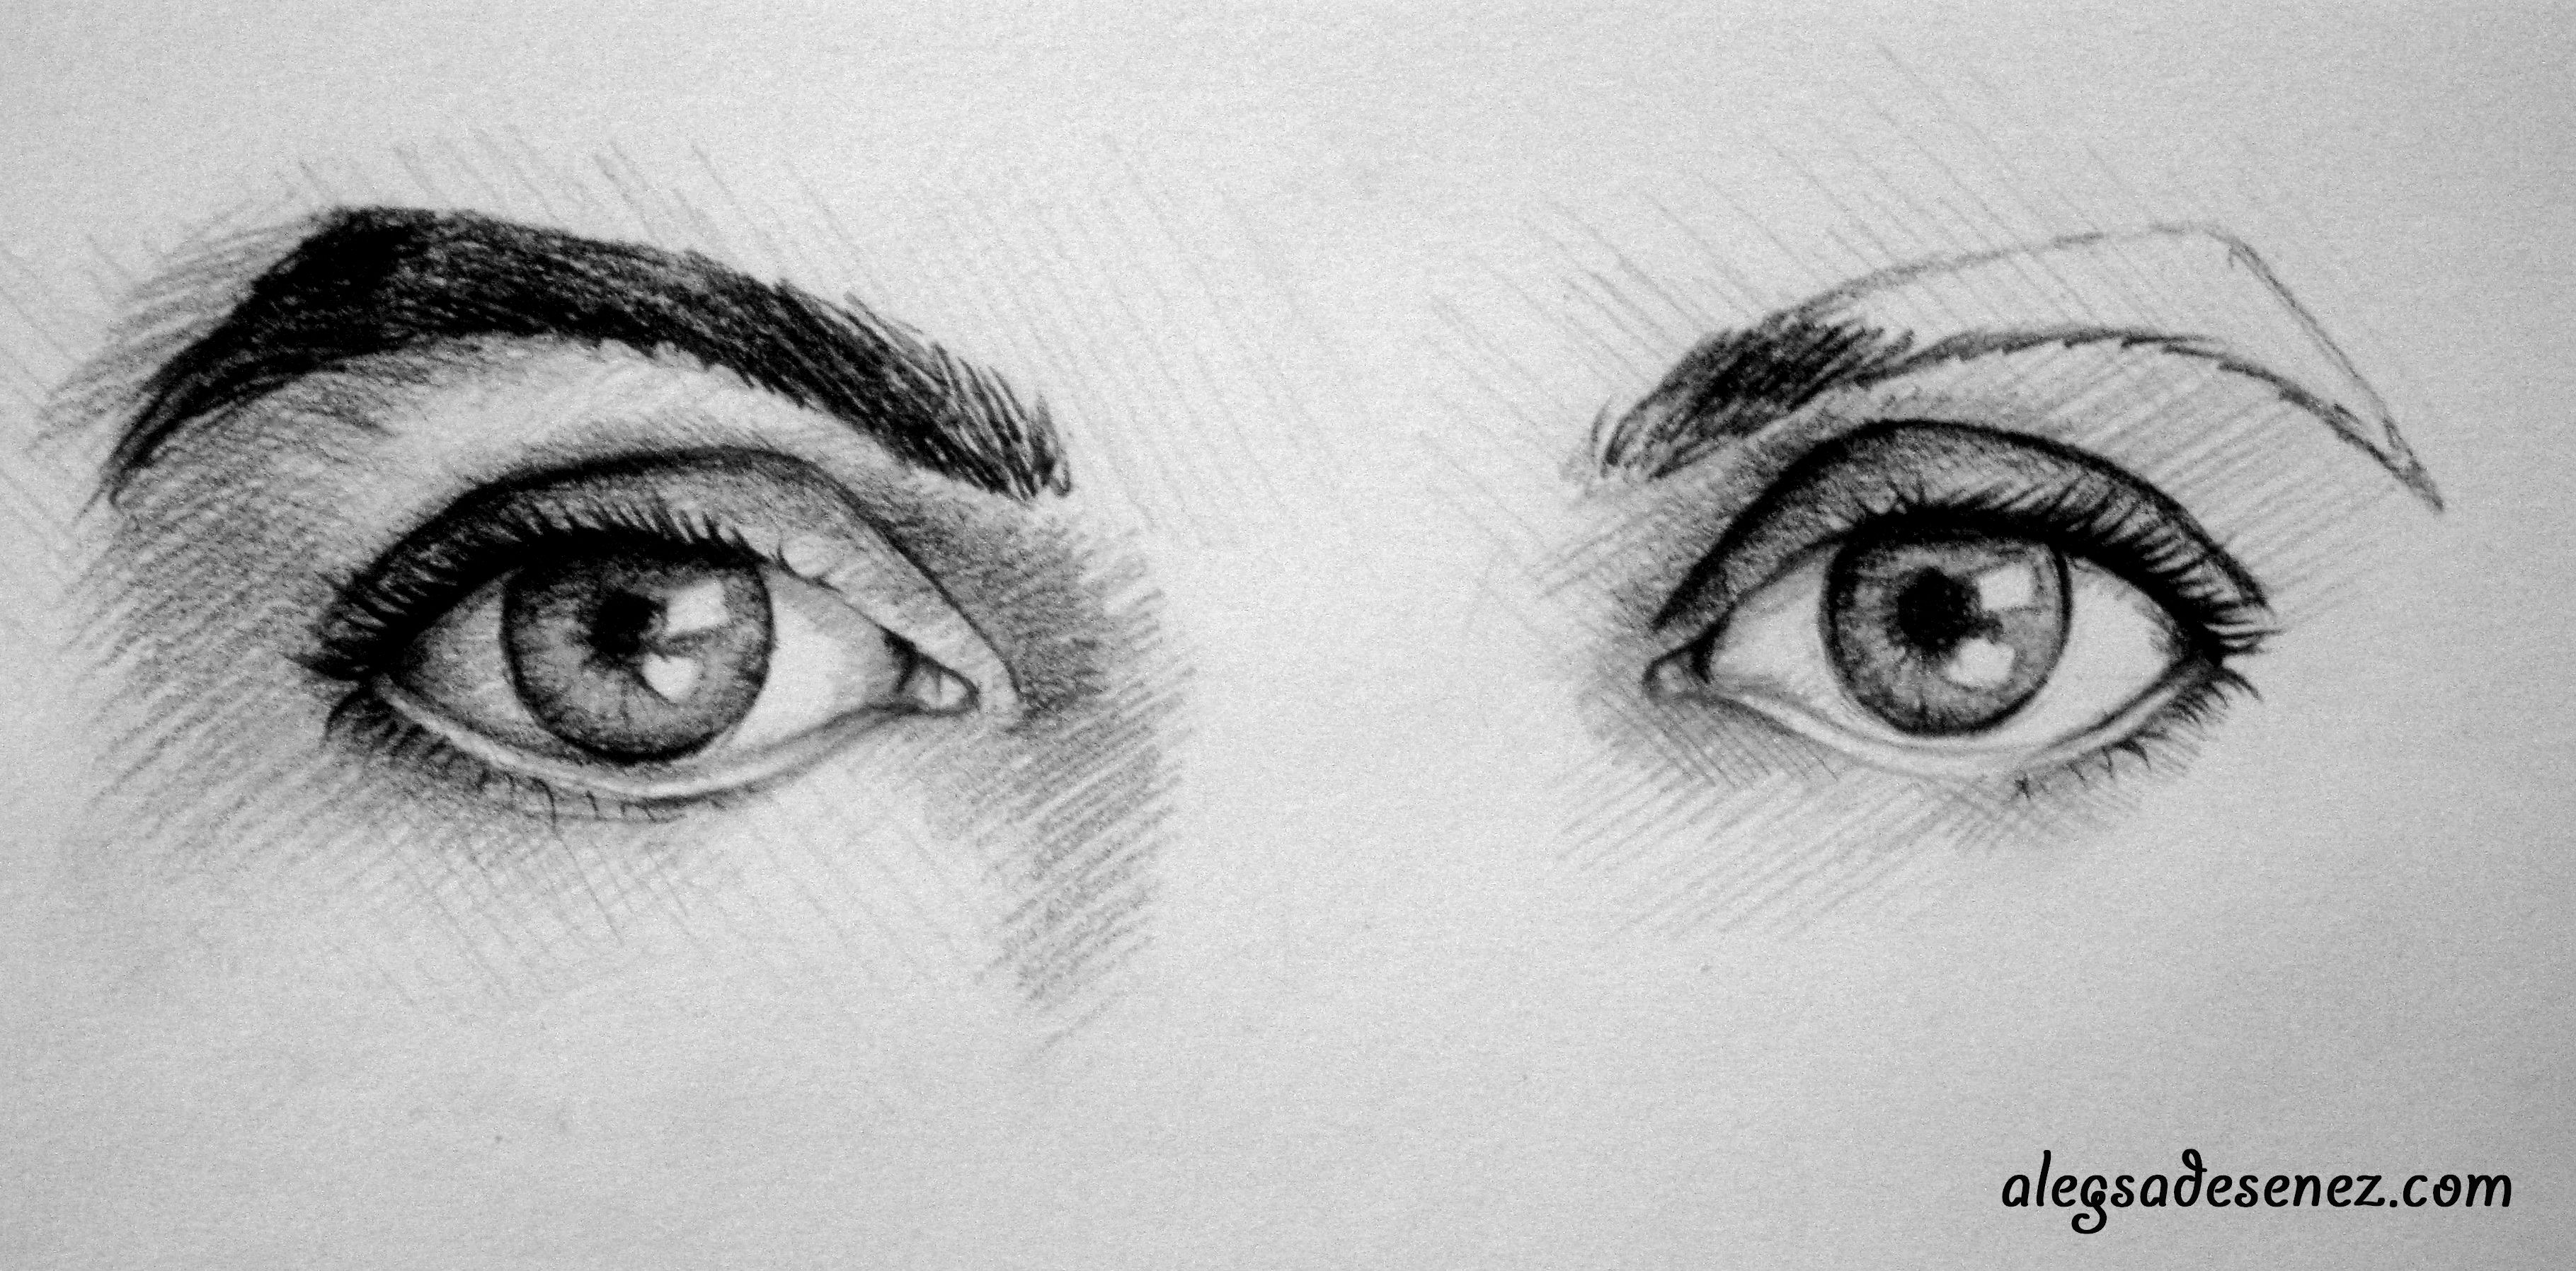 7 Pasi Cu Ajutorul Carora Sa Desenezi Ochii Aleg Sa Desenez